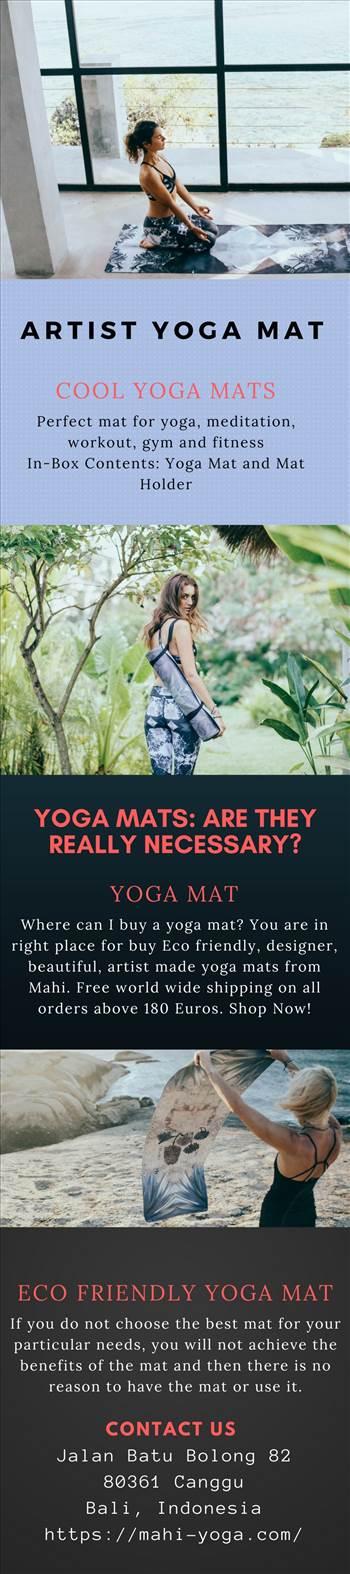 Where Can I Buy A Yoga Mat.jpg by Mahiyoga